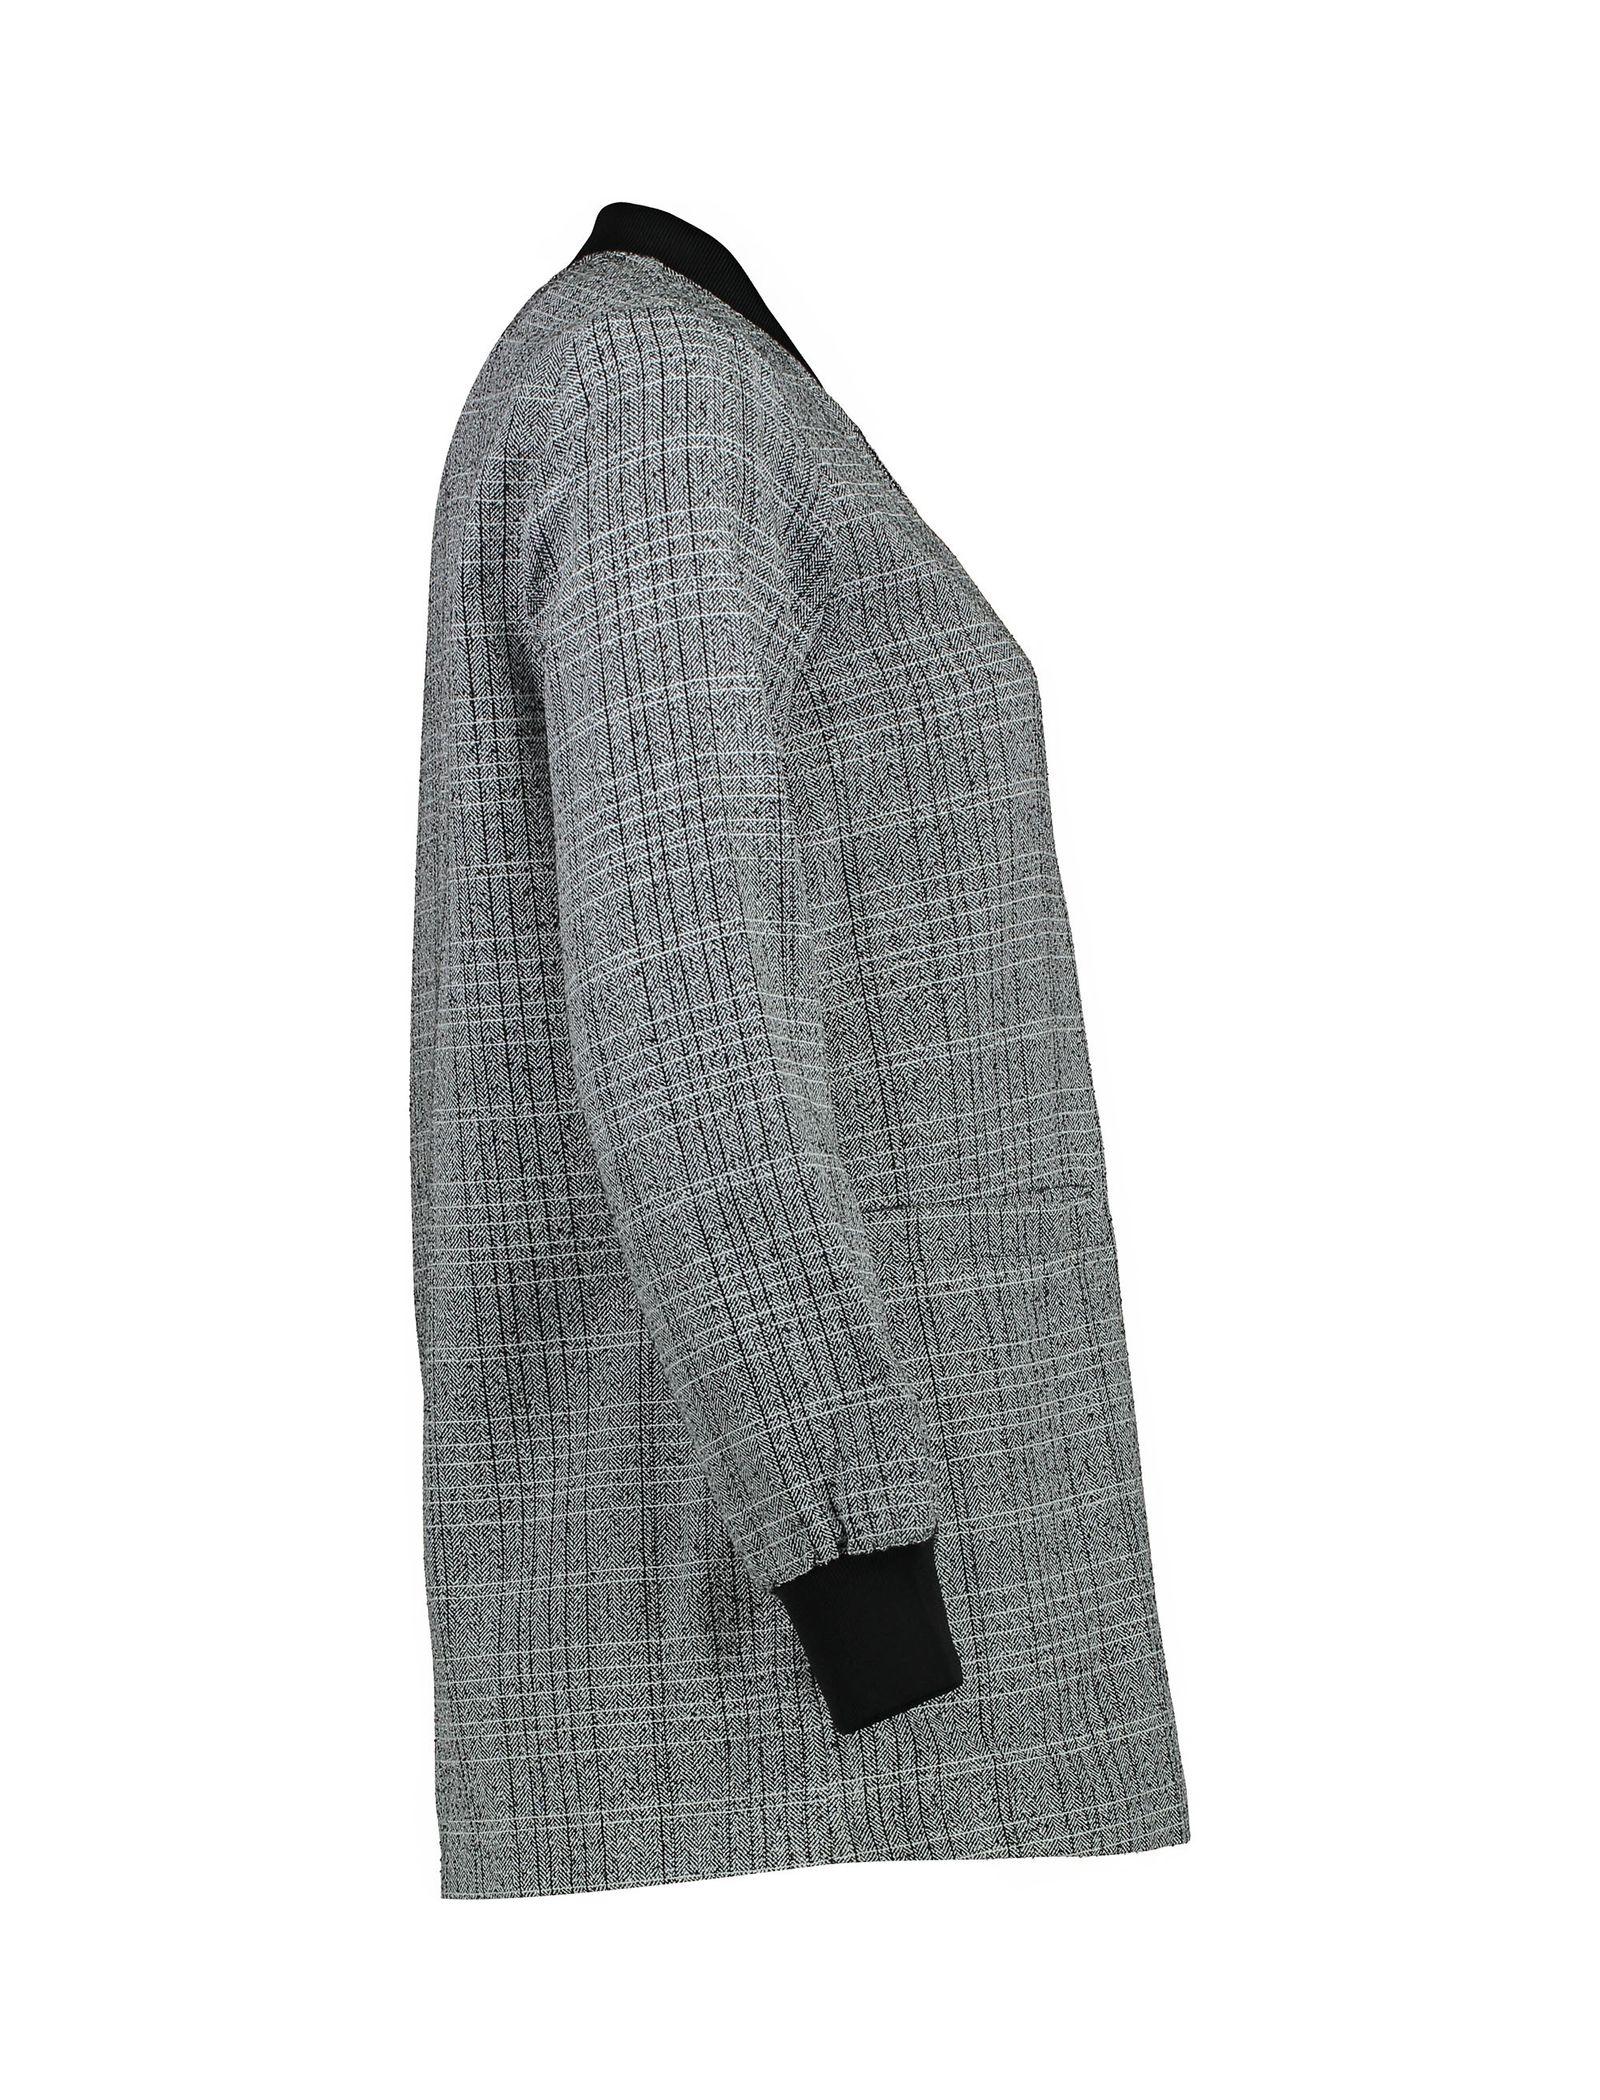 کت ویسکوز بلند زنانه - کوتون - طوسي - 4